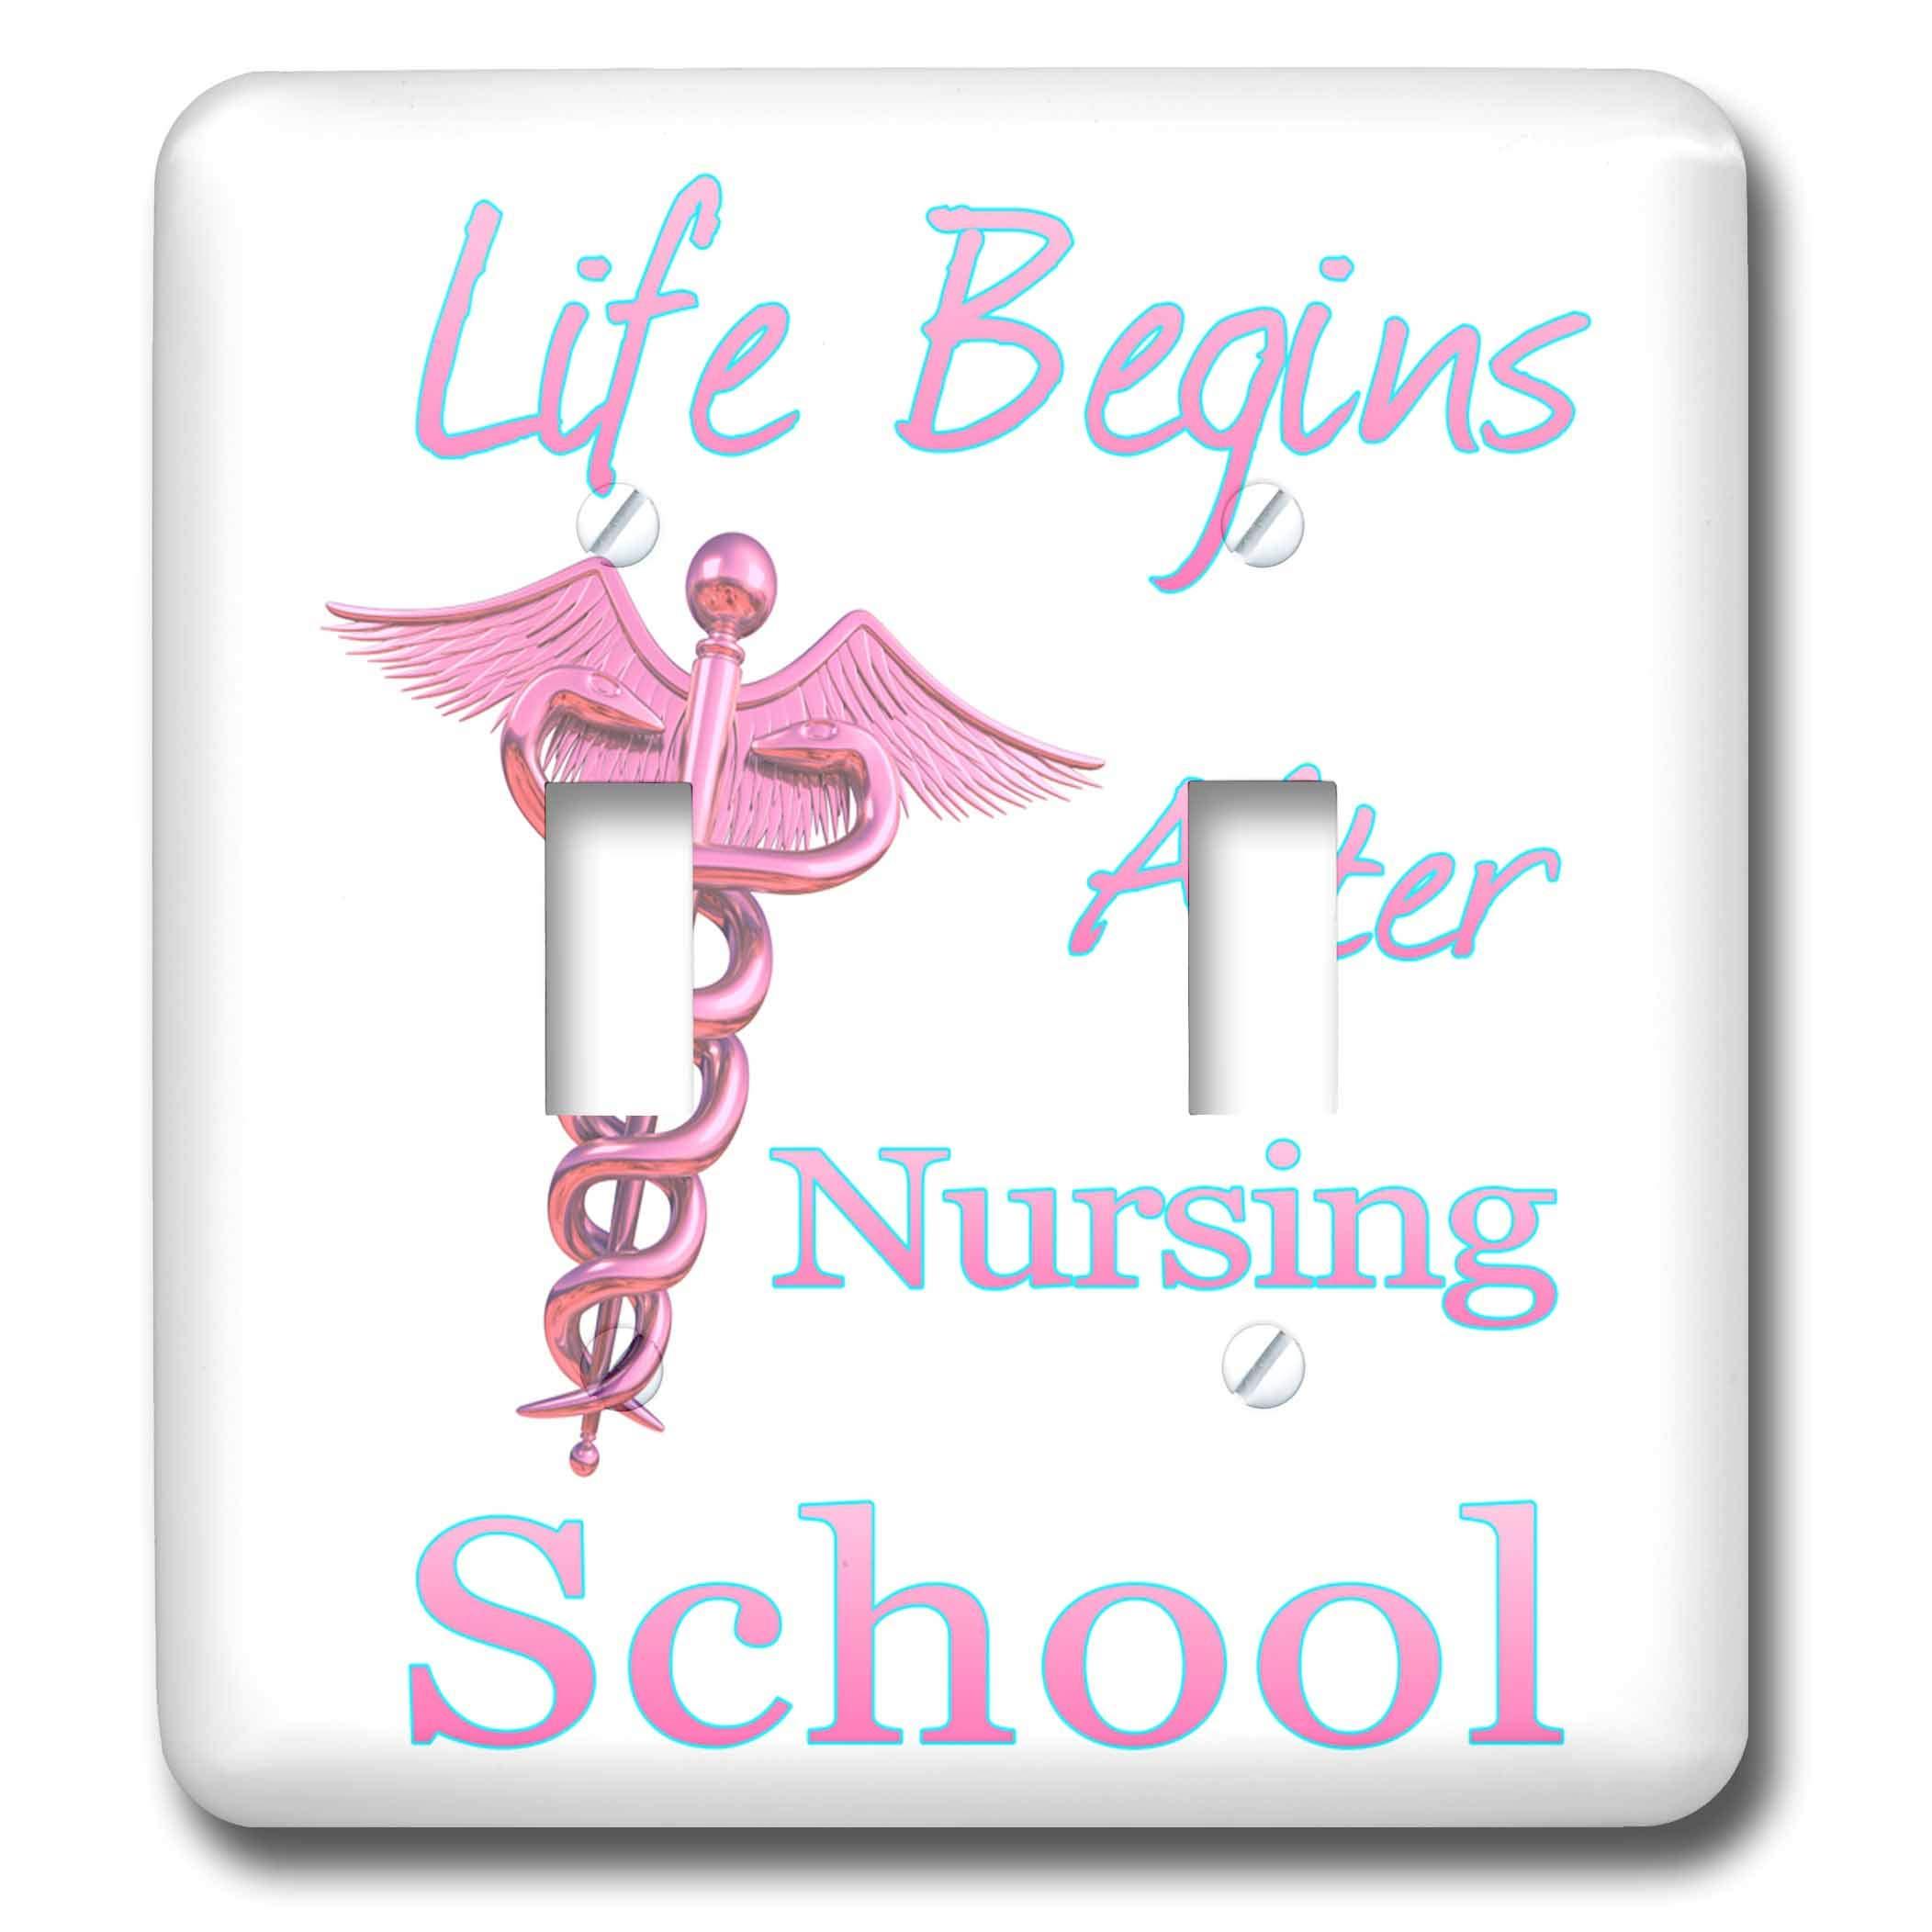 3dRose MacDonald Creative Studios – Nursing - Life Begins After Nursing School funny nursing gift for nurse graduate - Light Switch Covers - double toggle switch (lsp_295398_2)